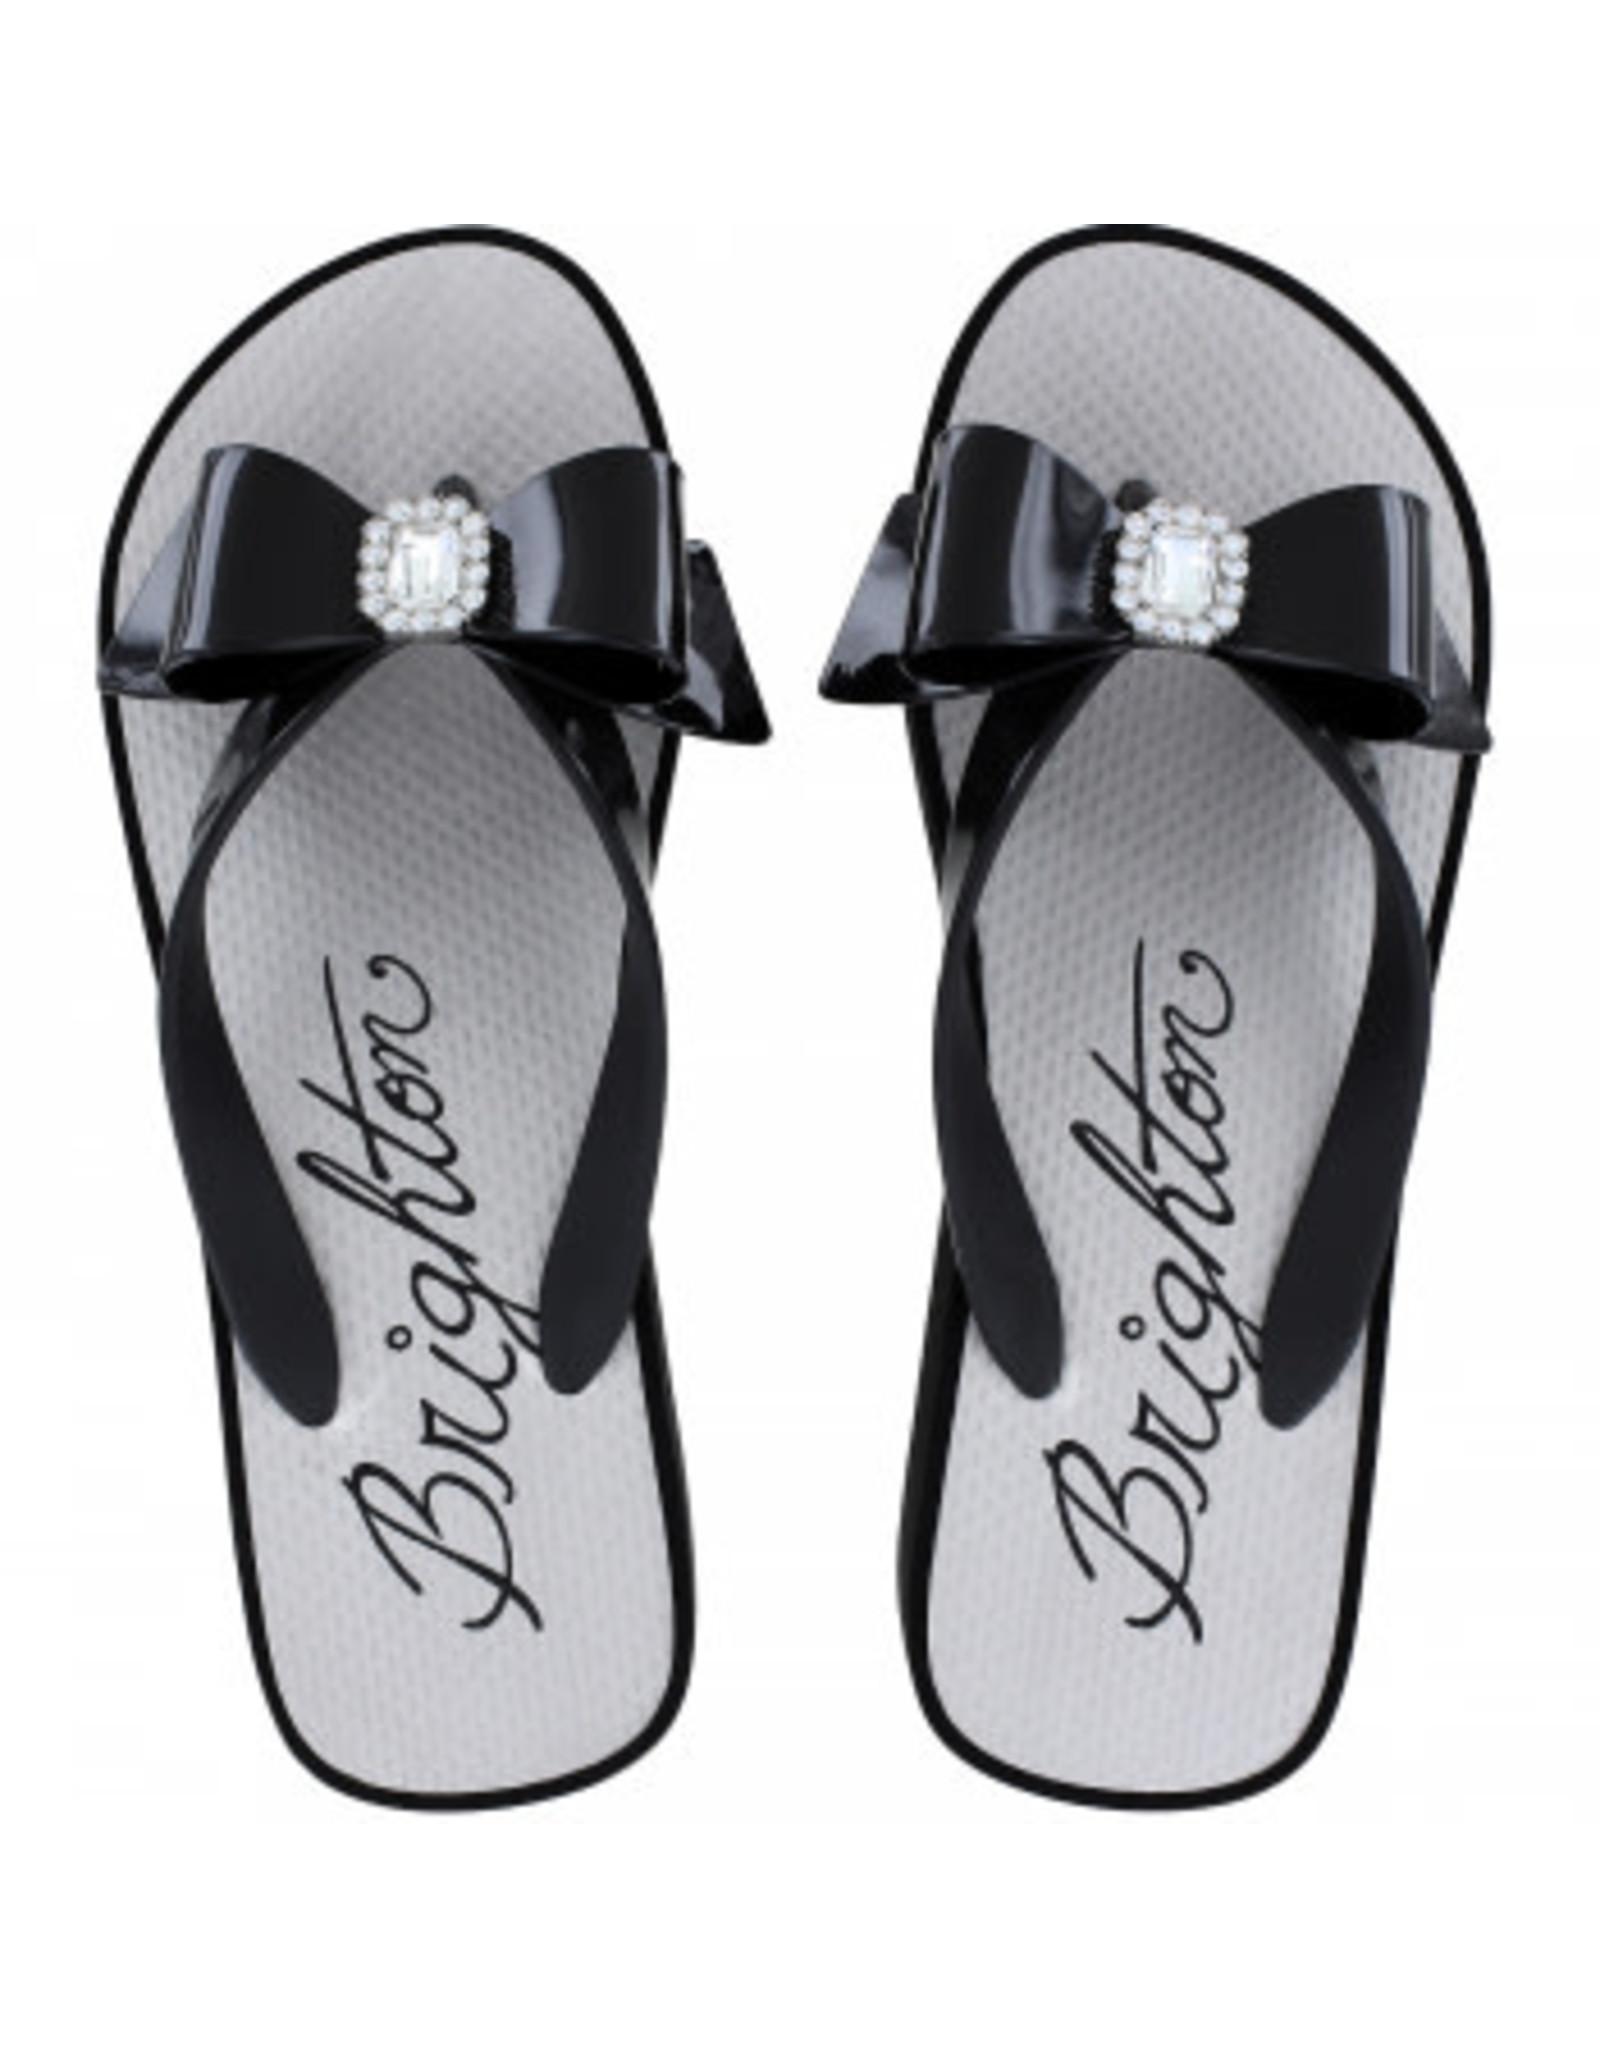 Brighton Brighton Flip Flops-Size 7